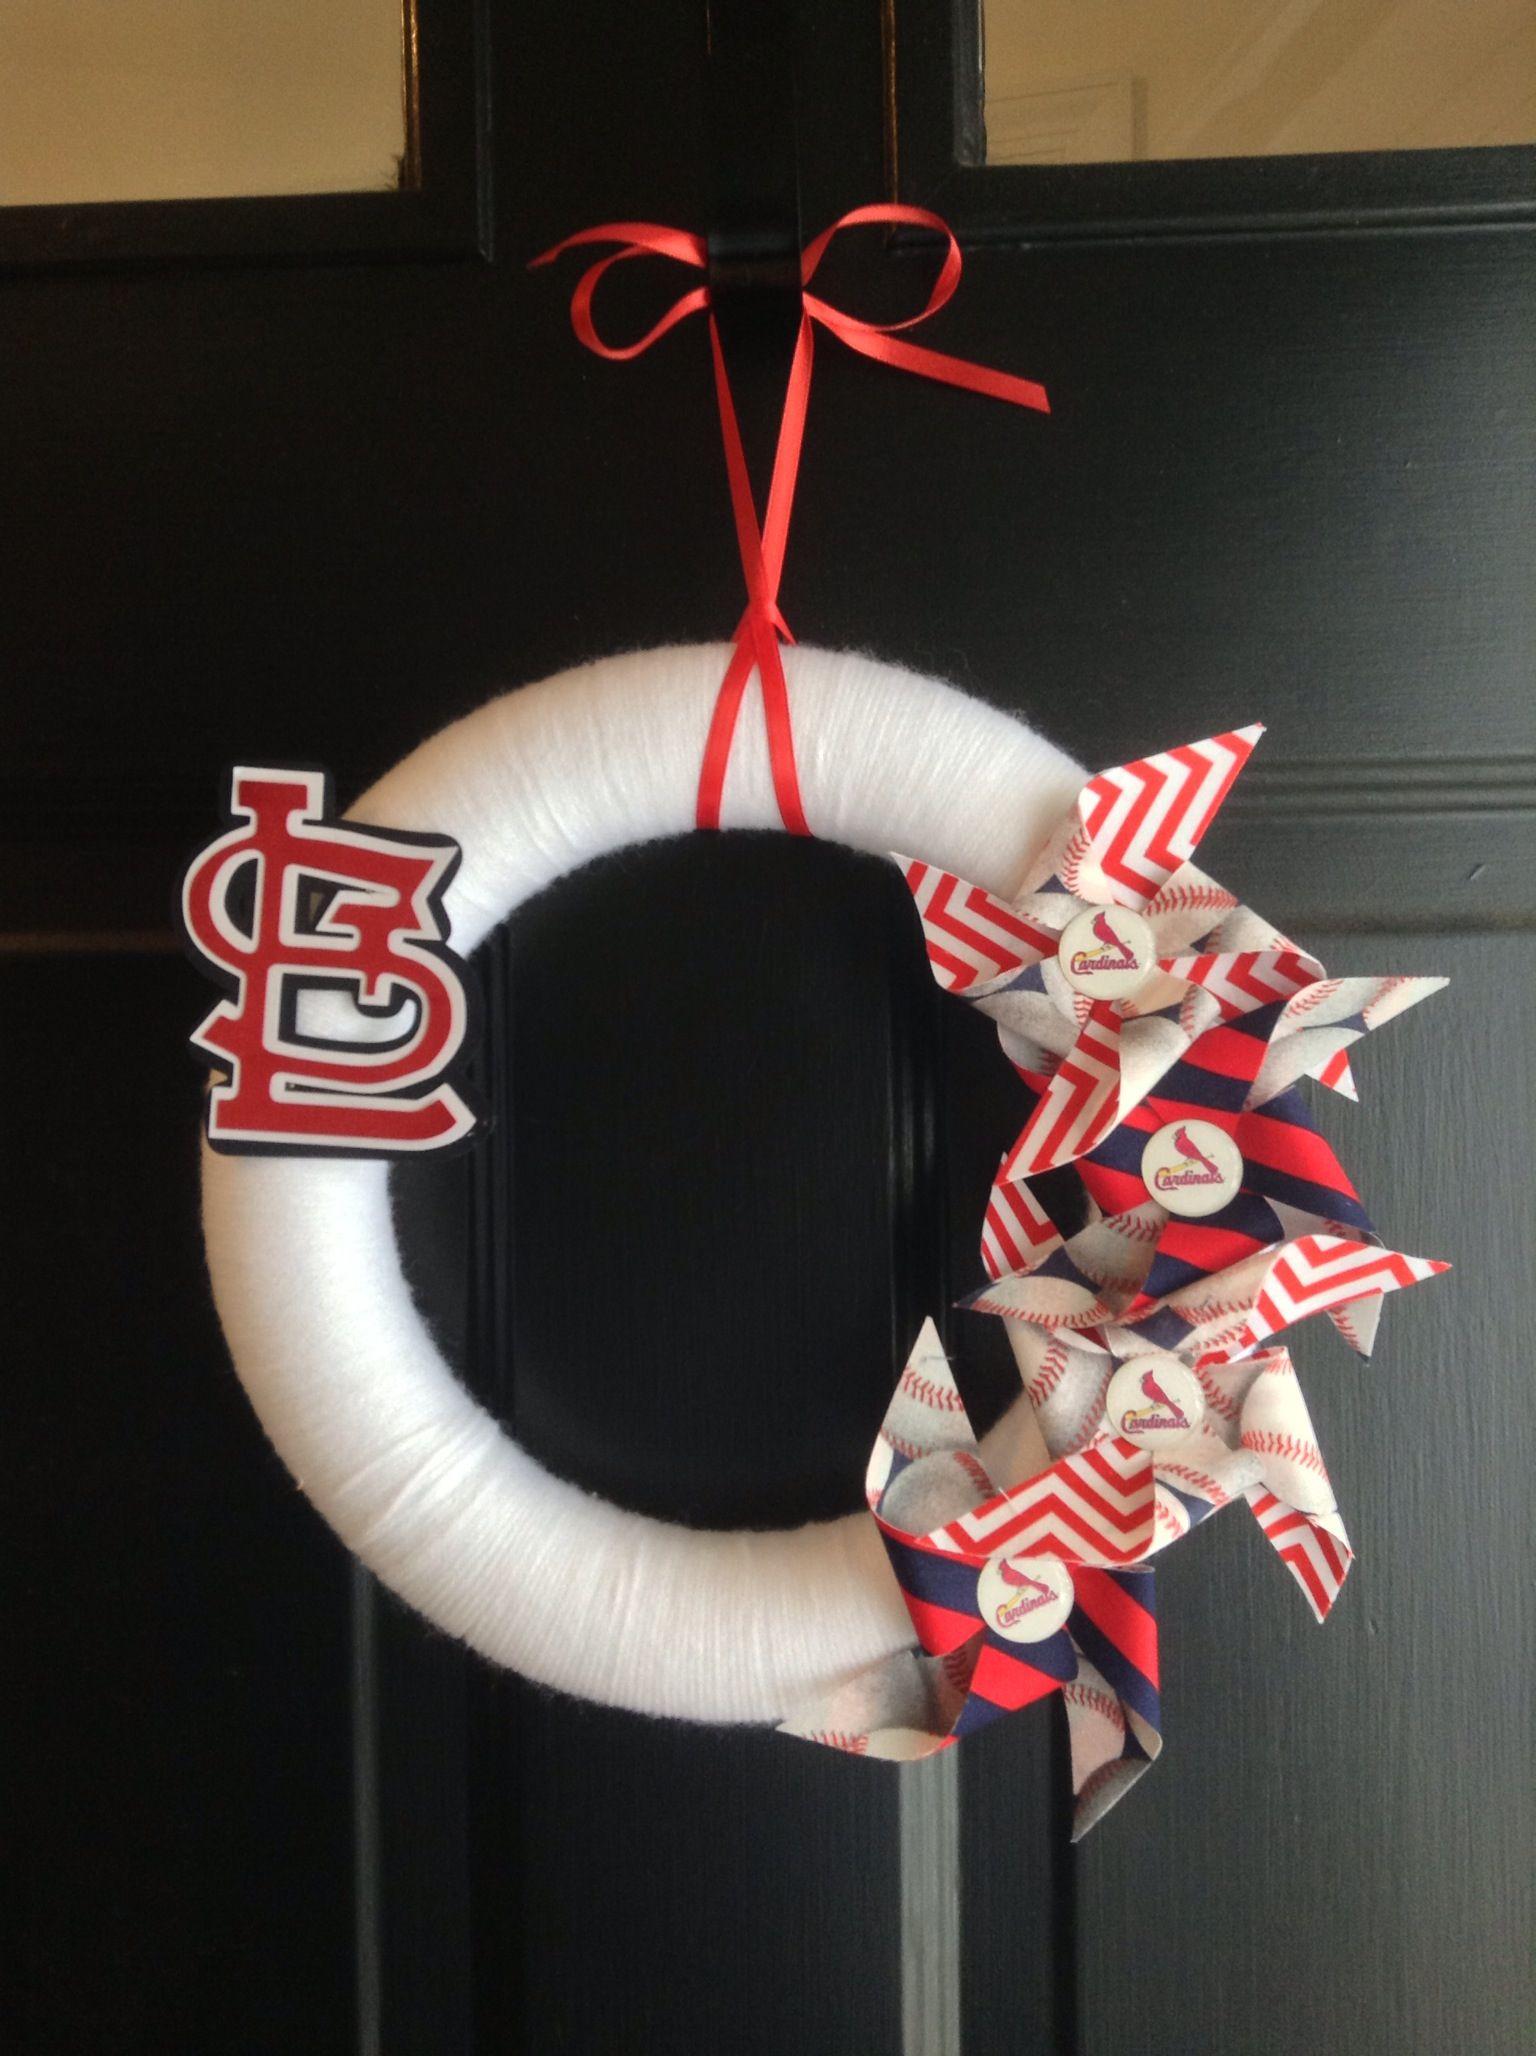 St Louis Cardinals Wreath $30 A New Item I Made